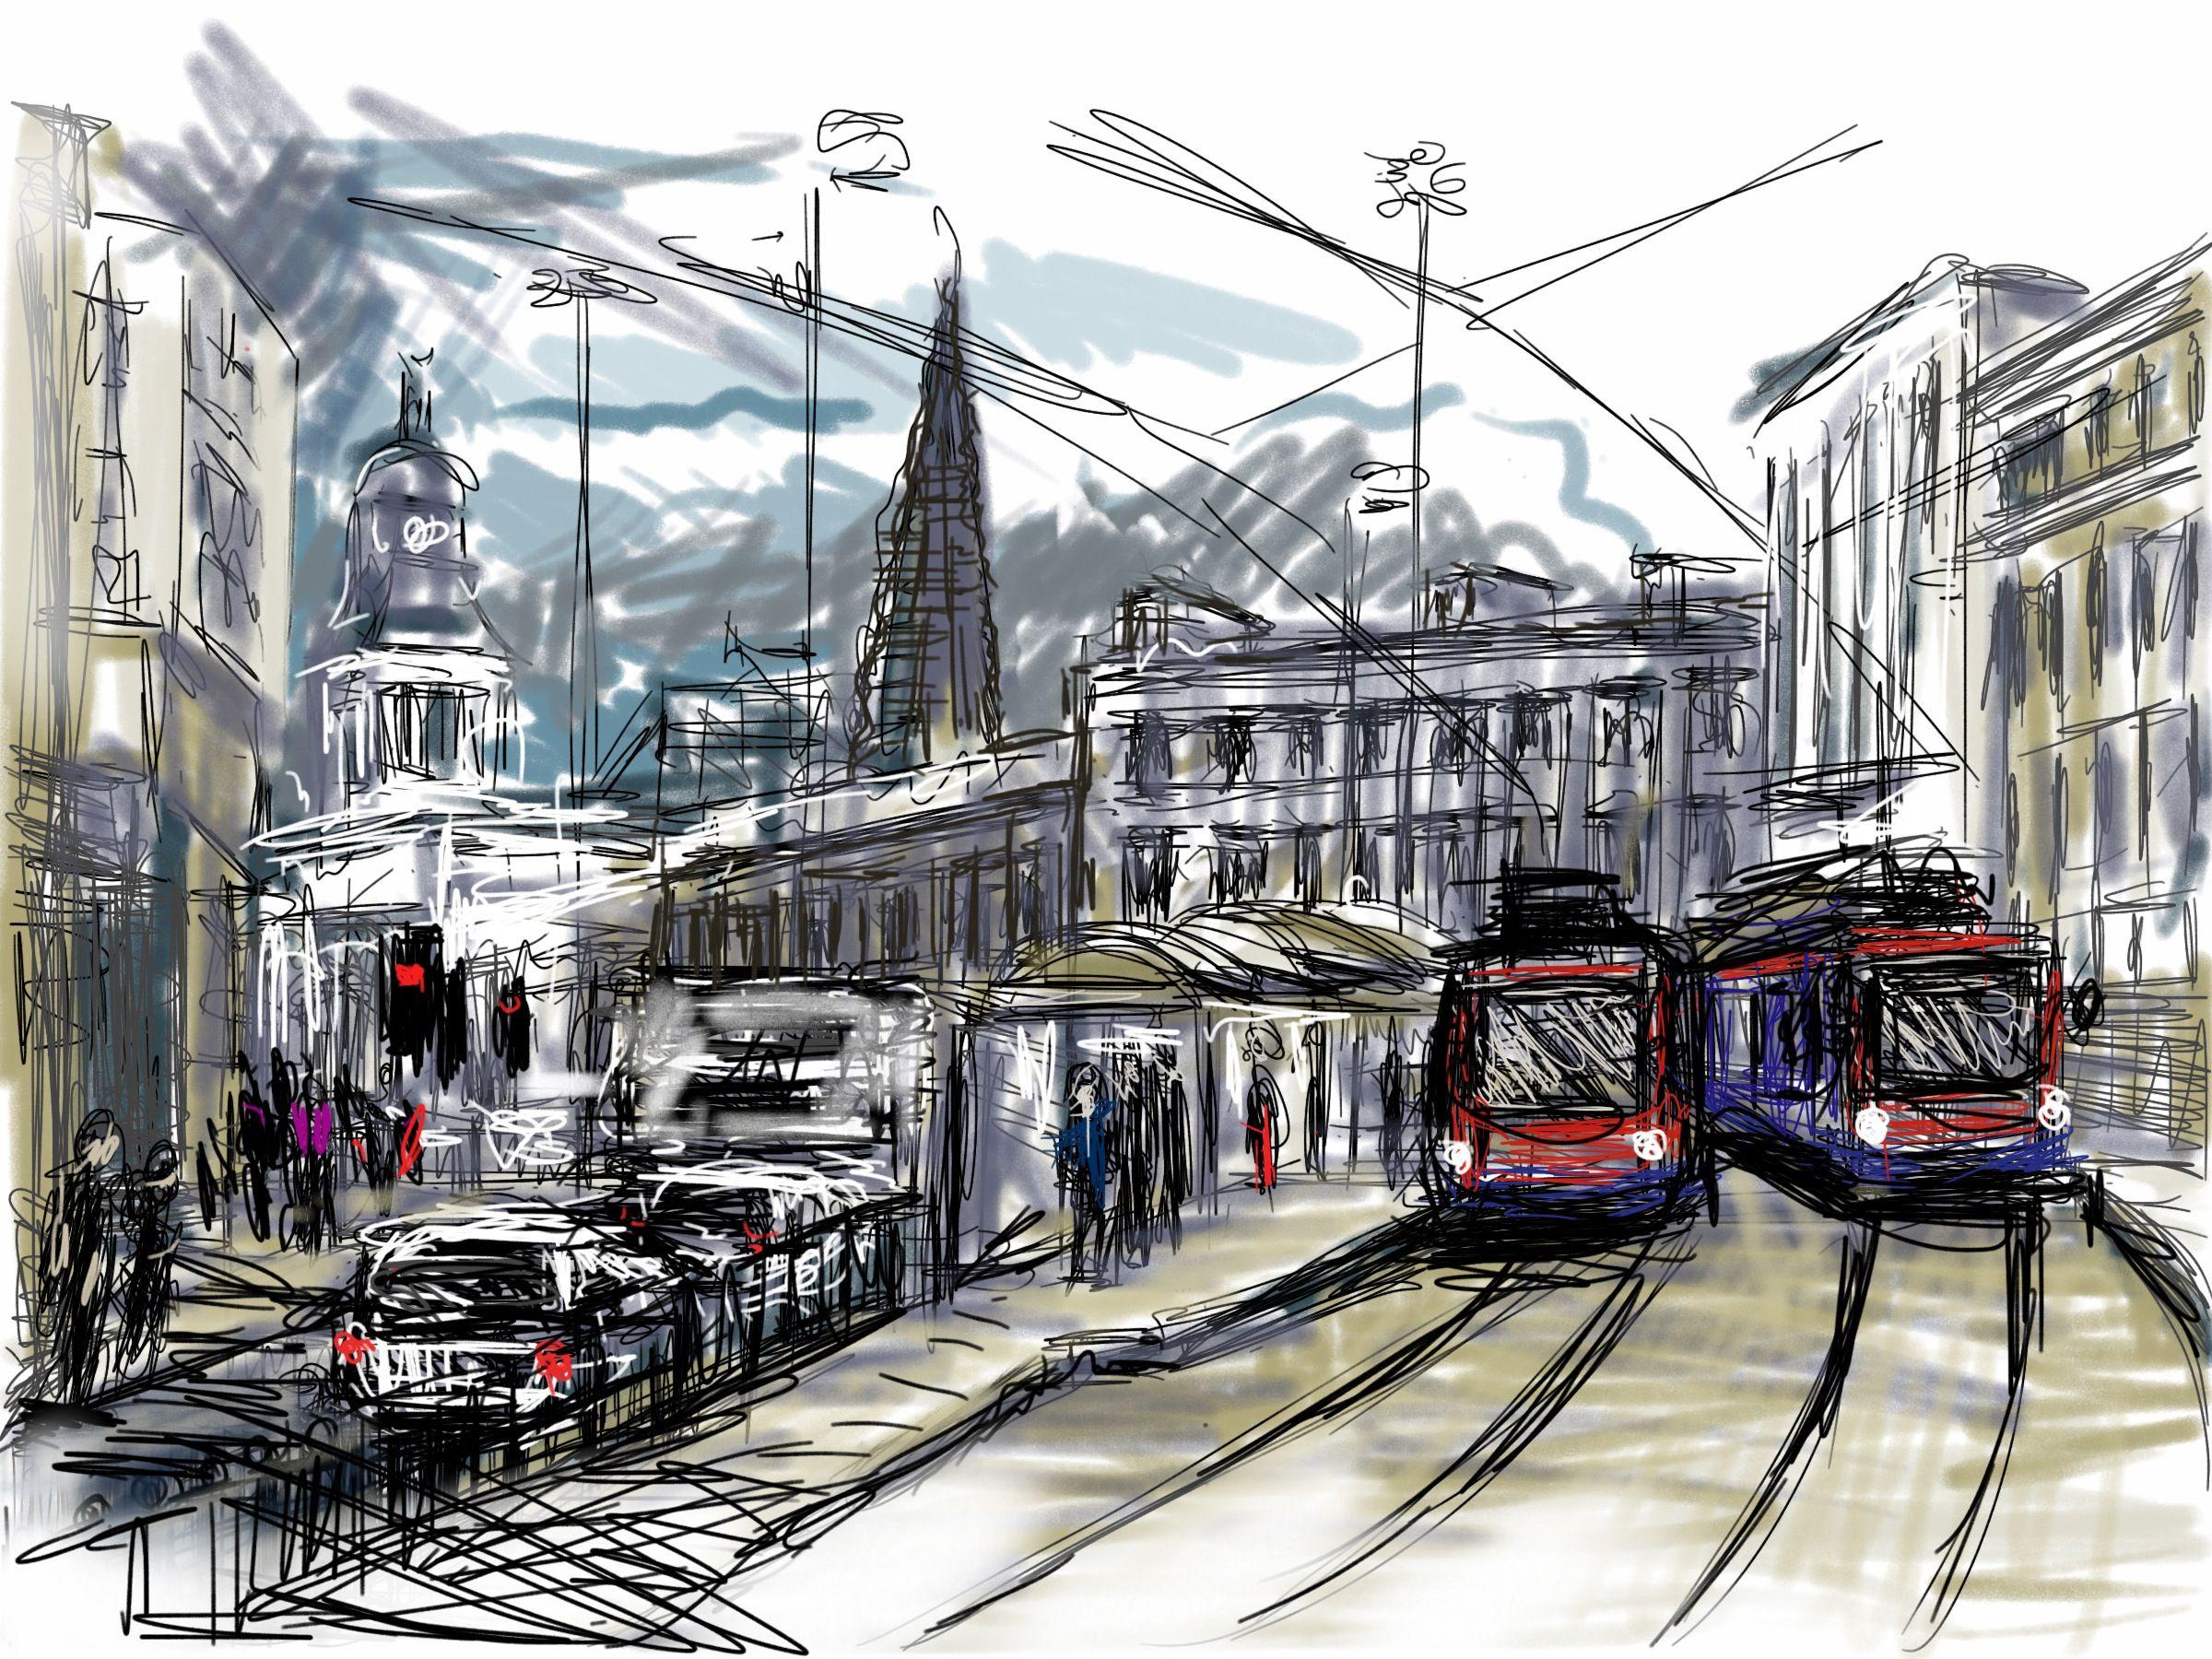 Craig Longmuir Tram Stop At Ponds Forge Ipad Drawing Iart Electrical App